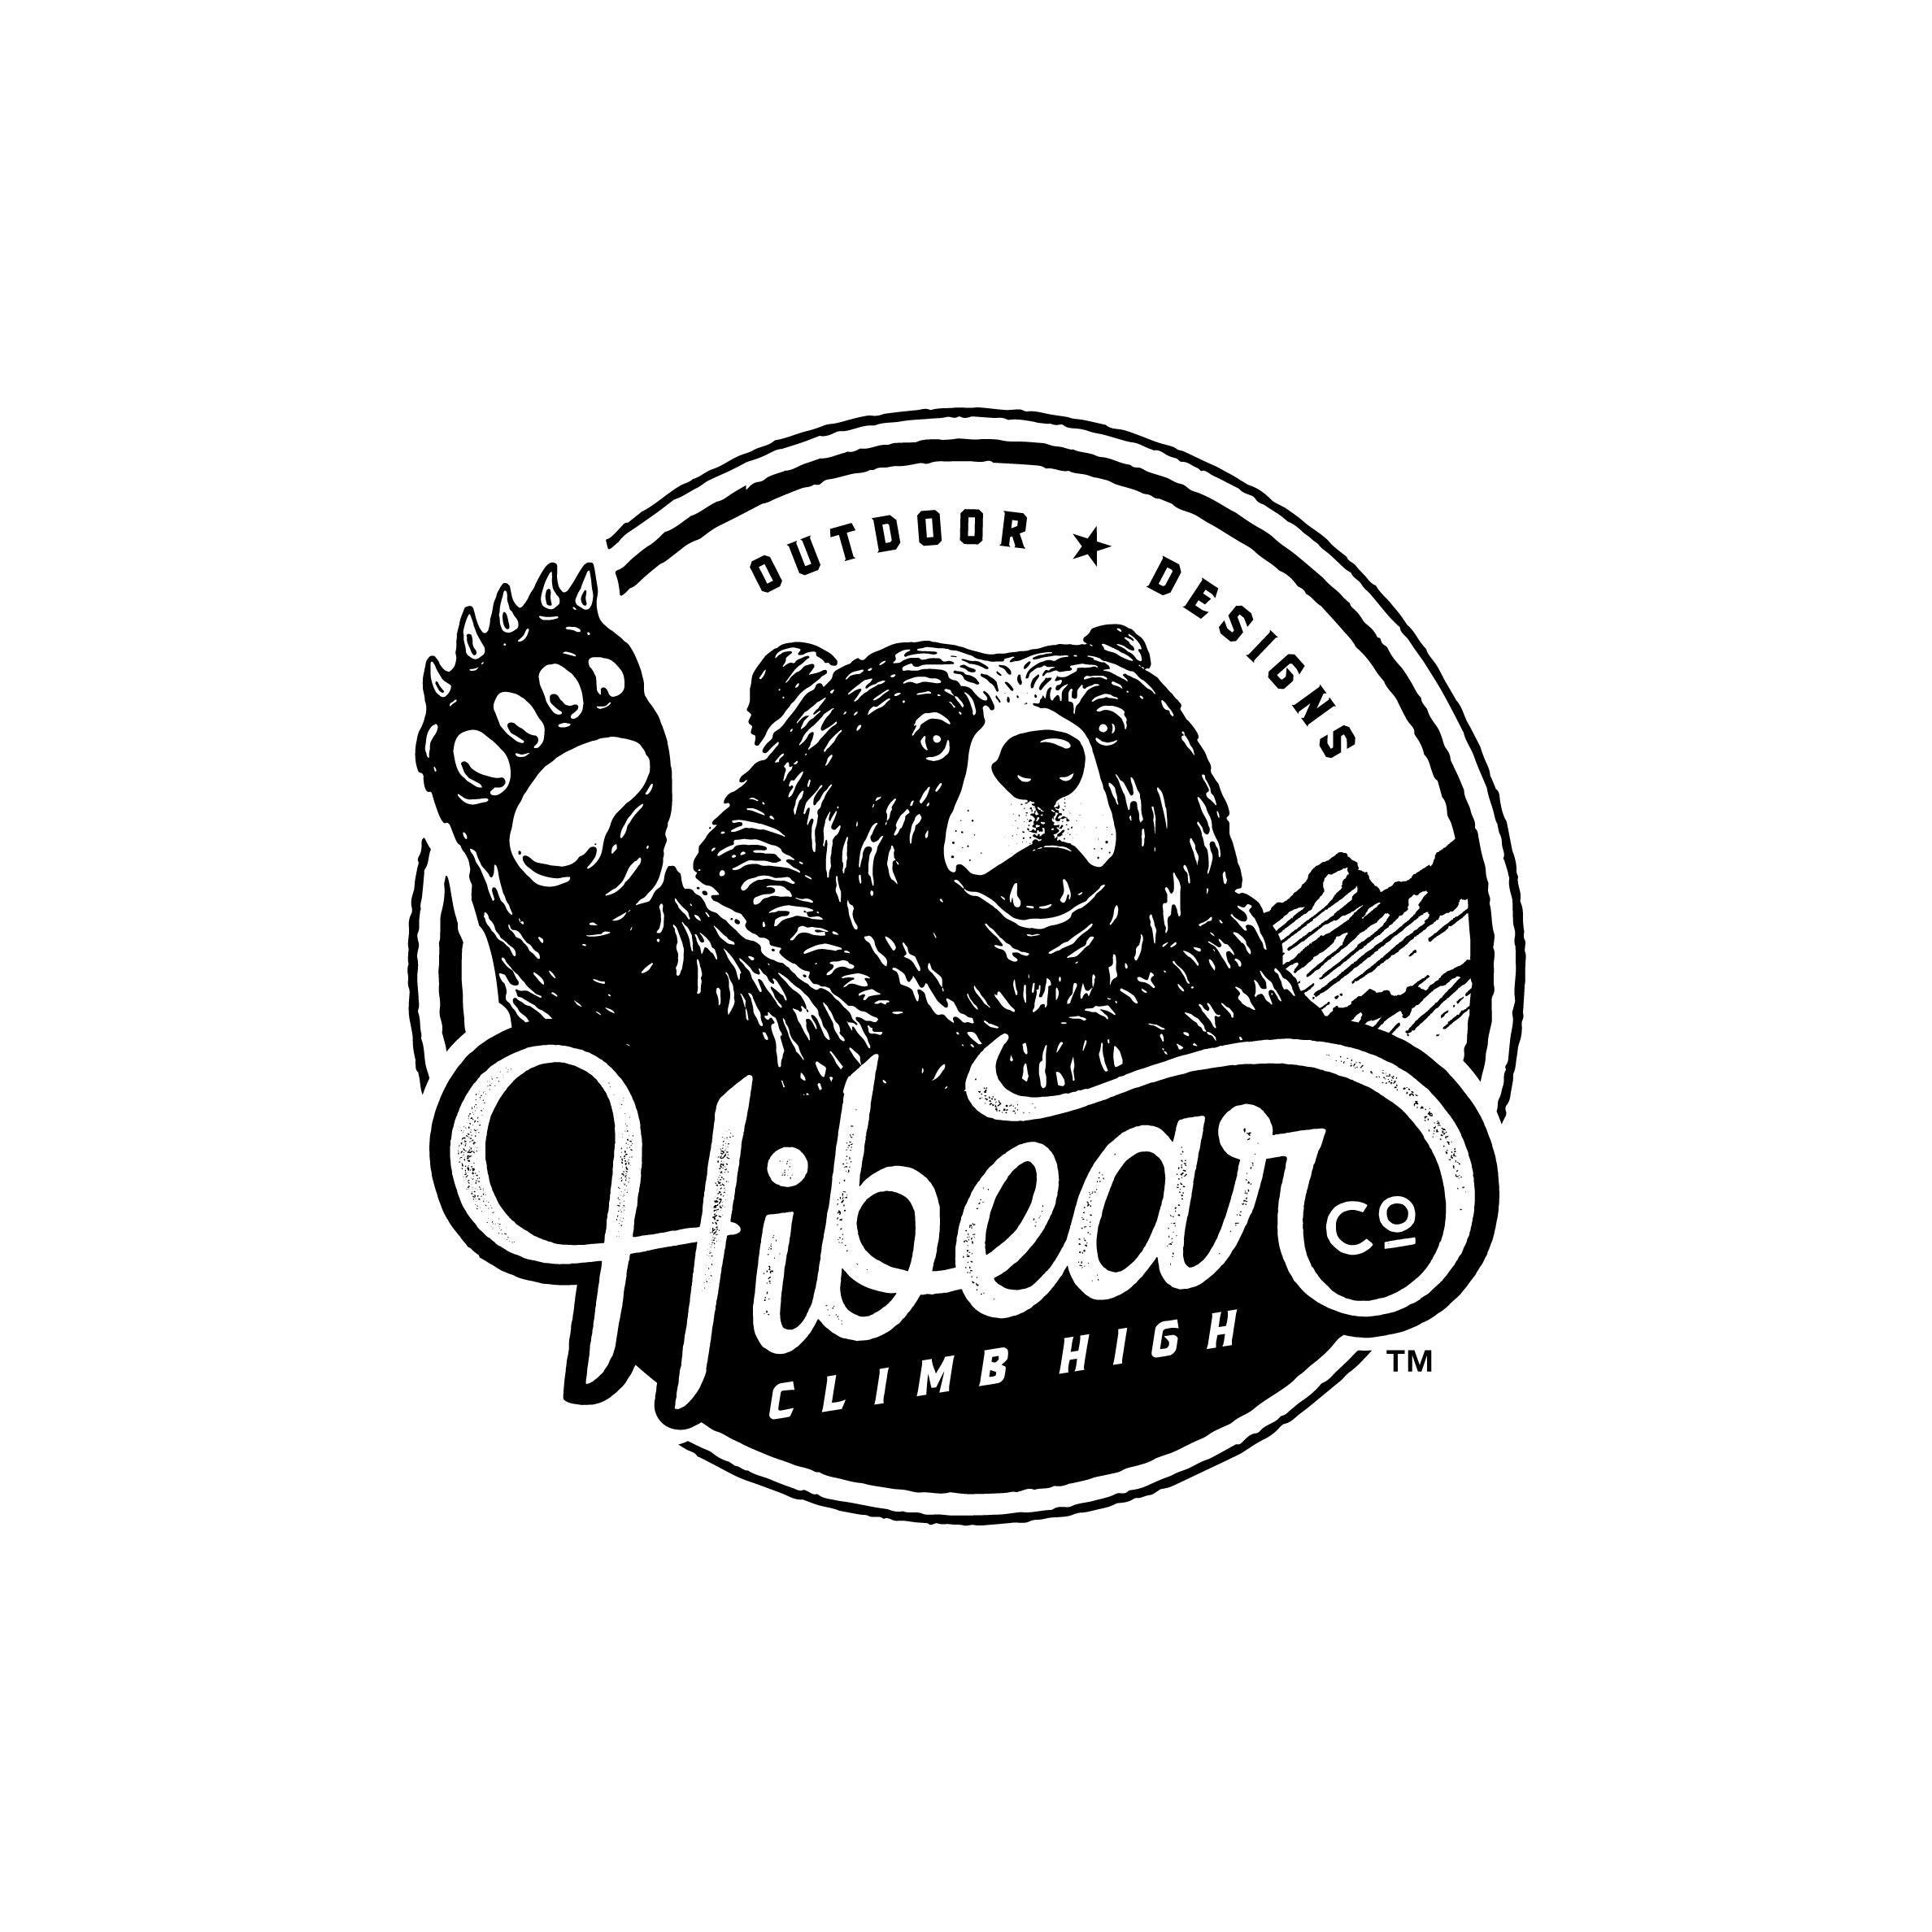 Hibear Design Company logo